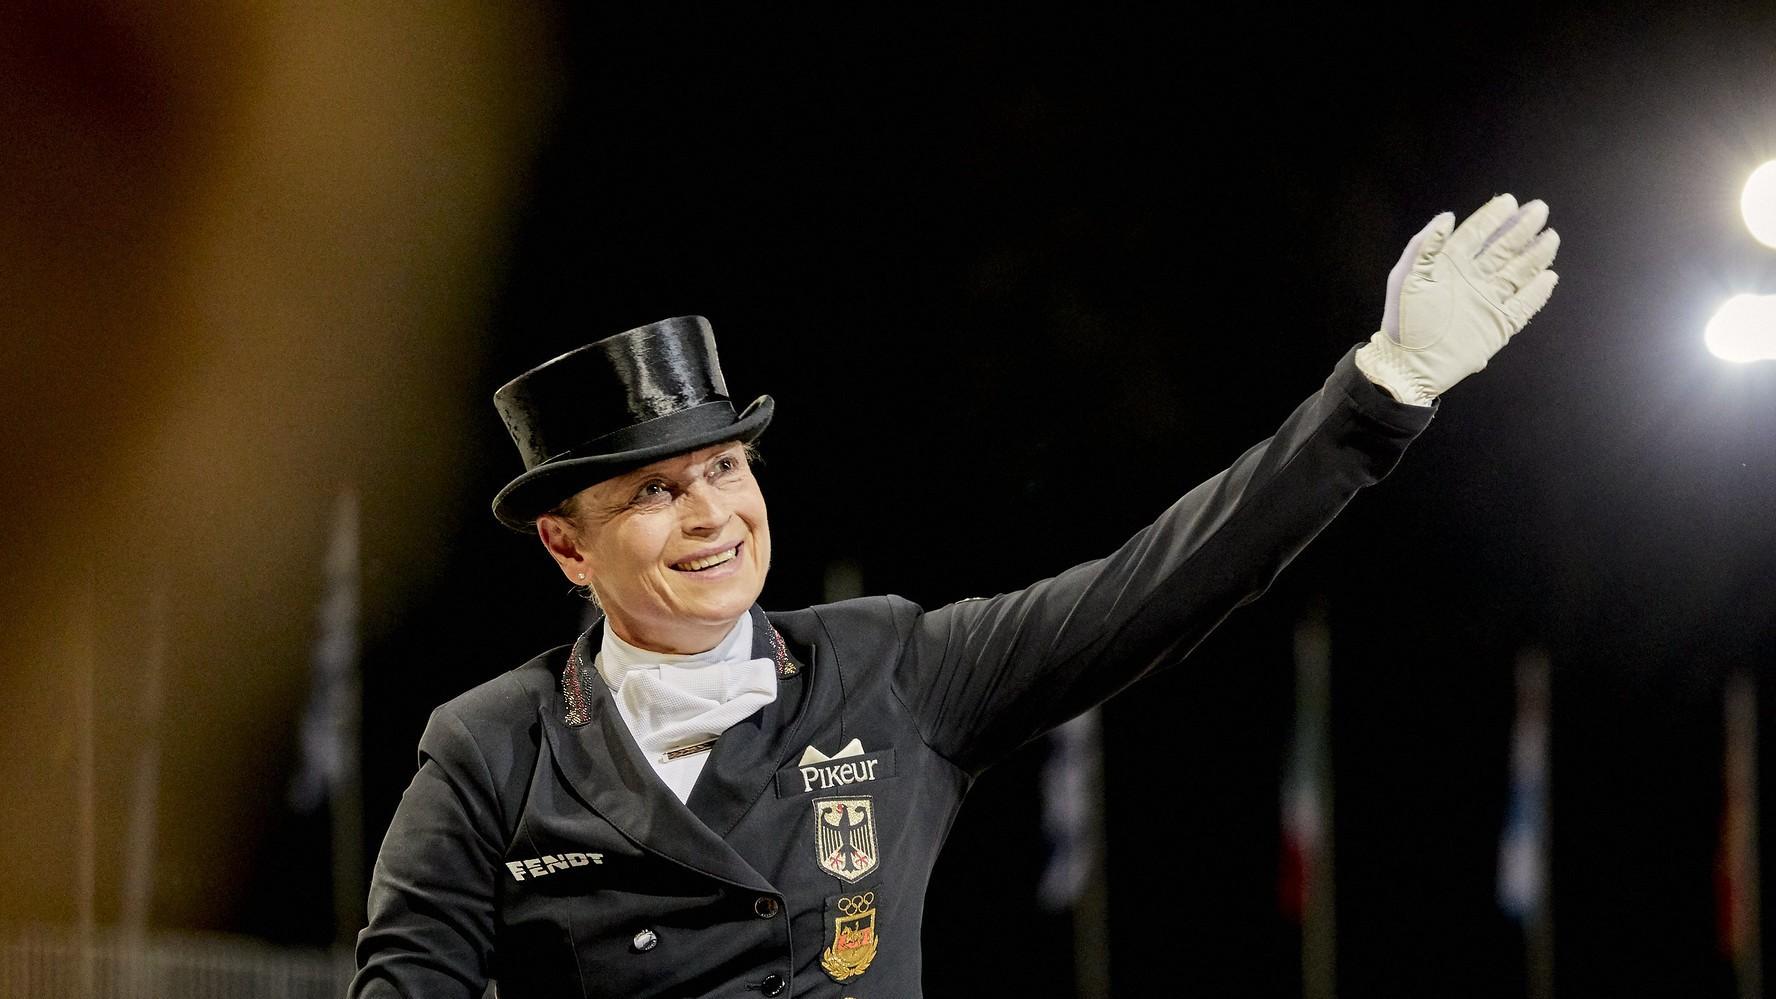 Isabell Werth Europees kampioen in de Special, Edward Gal achtste